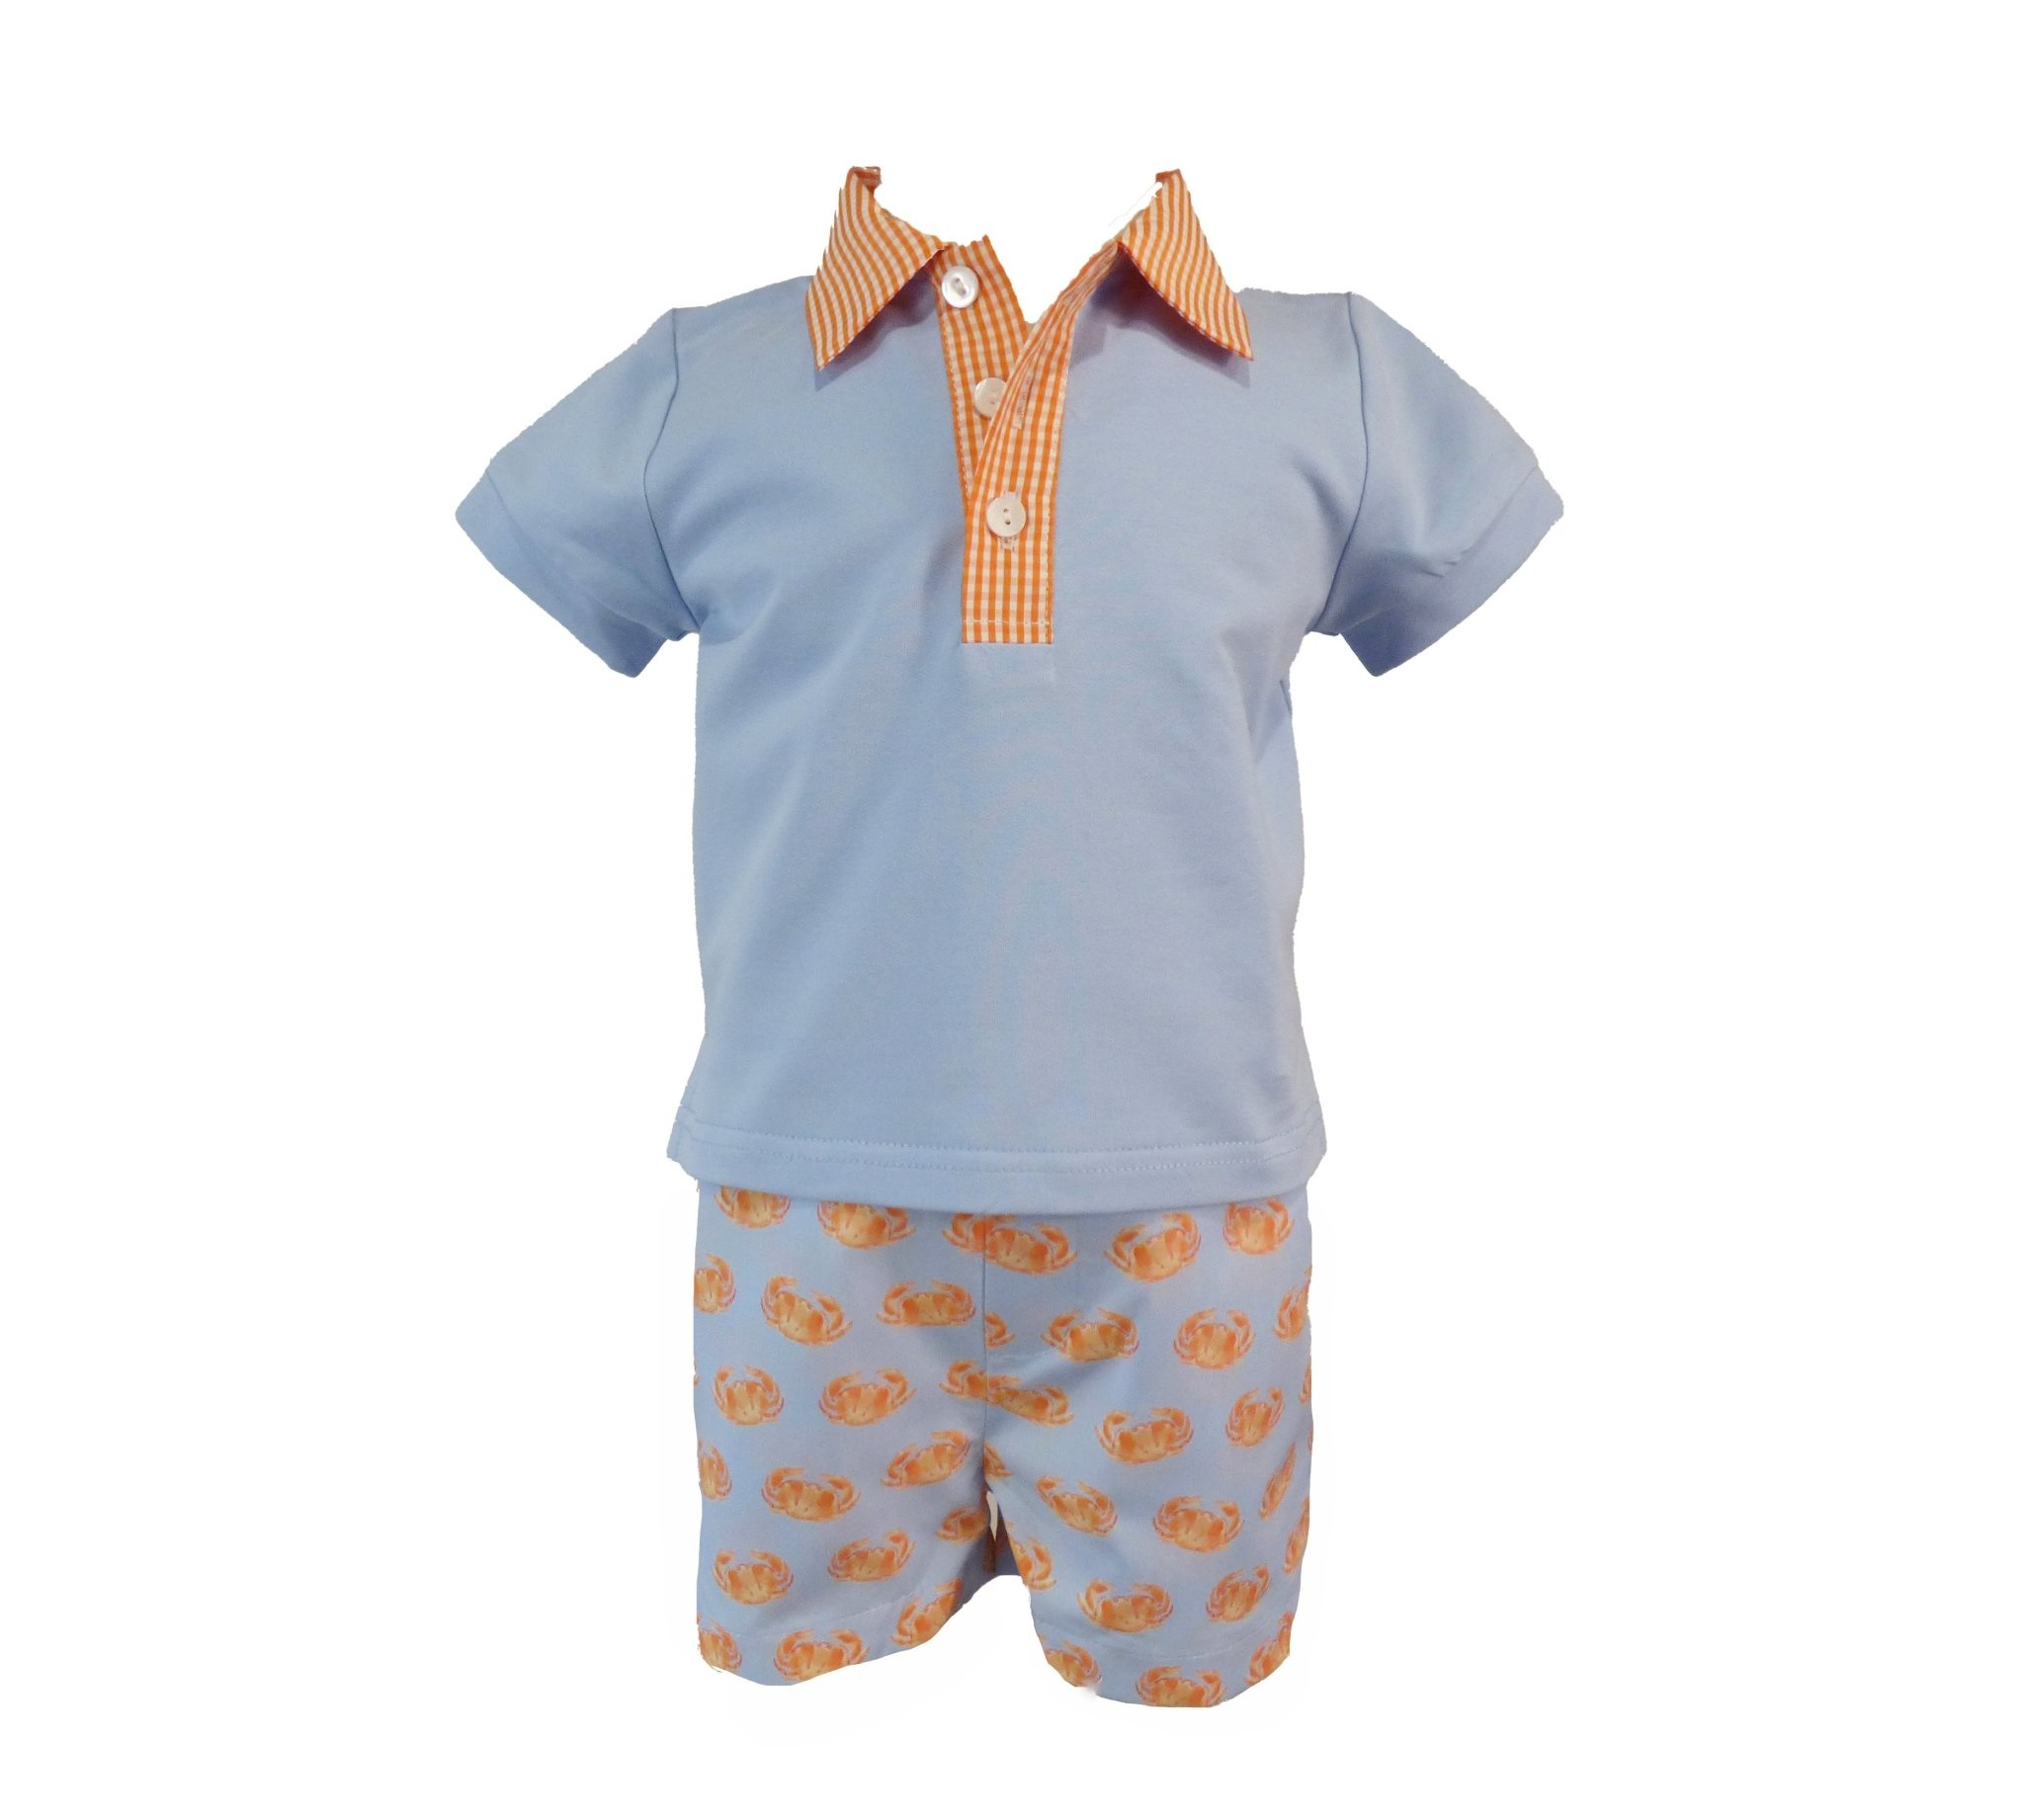 The Yellow Lamb Alexander Shirt and Shorts w Crabs